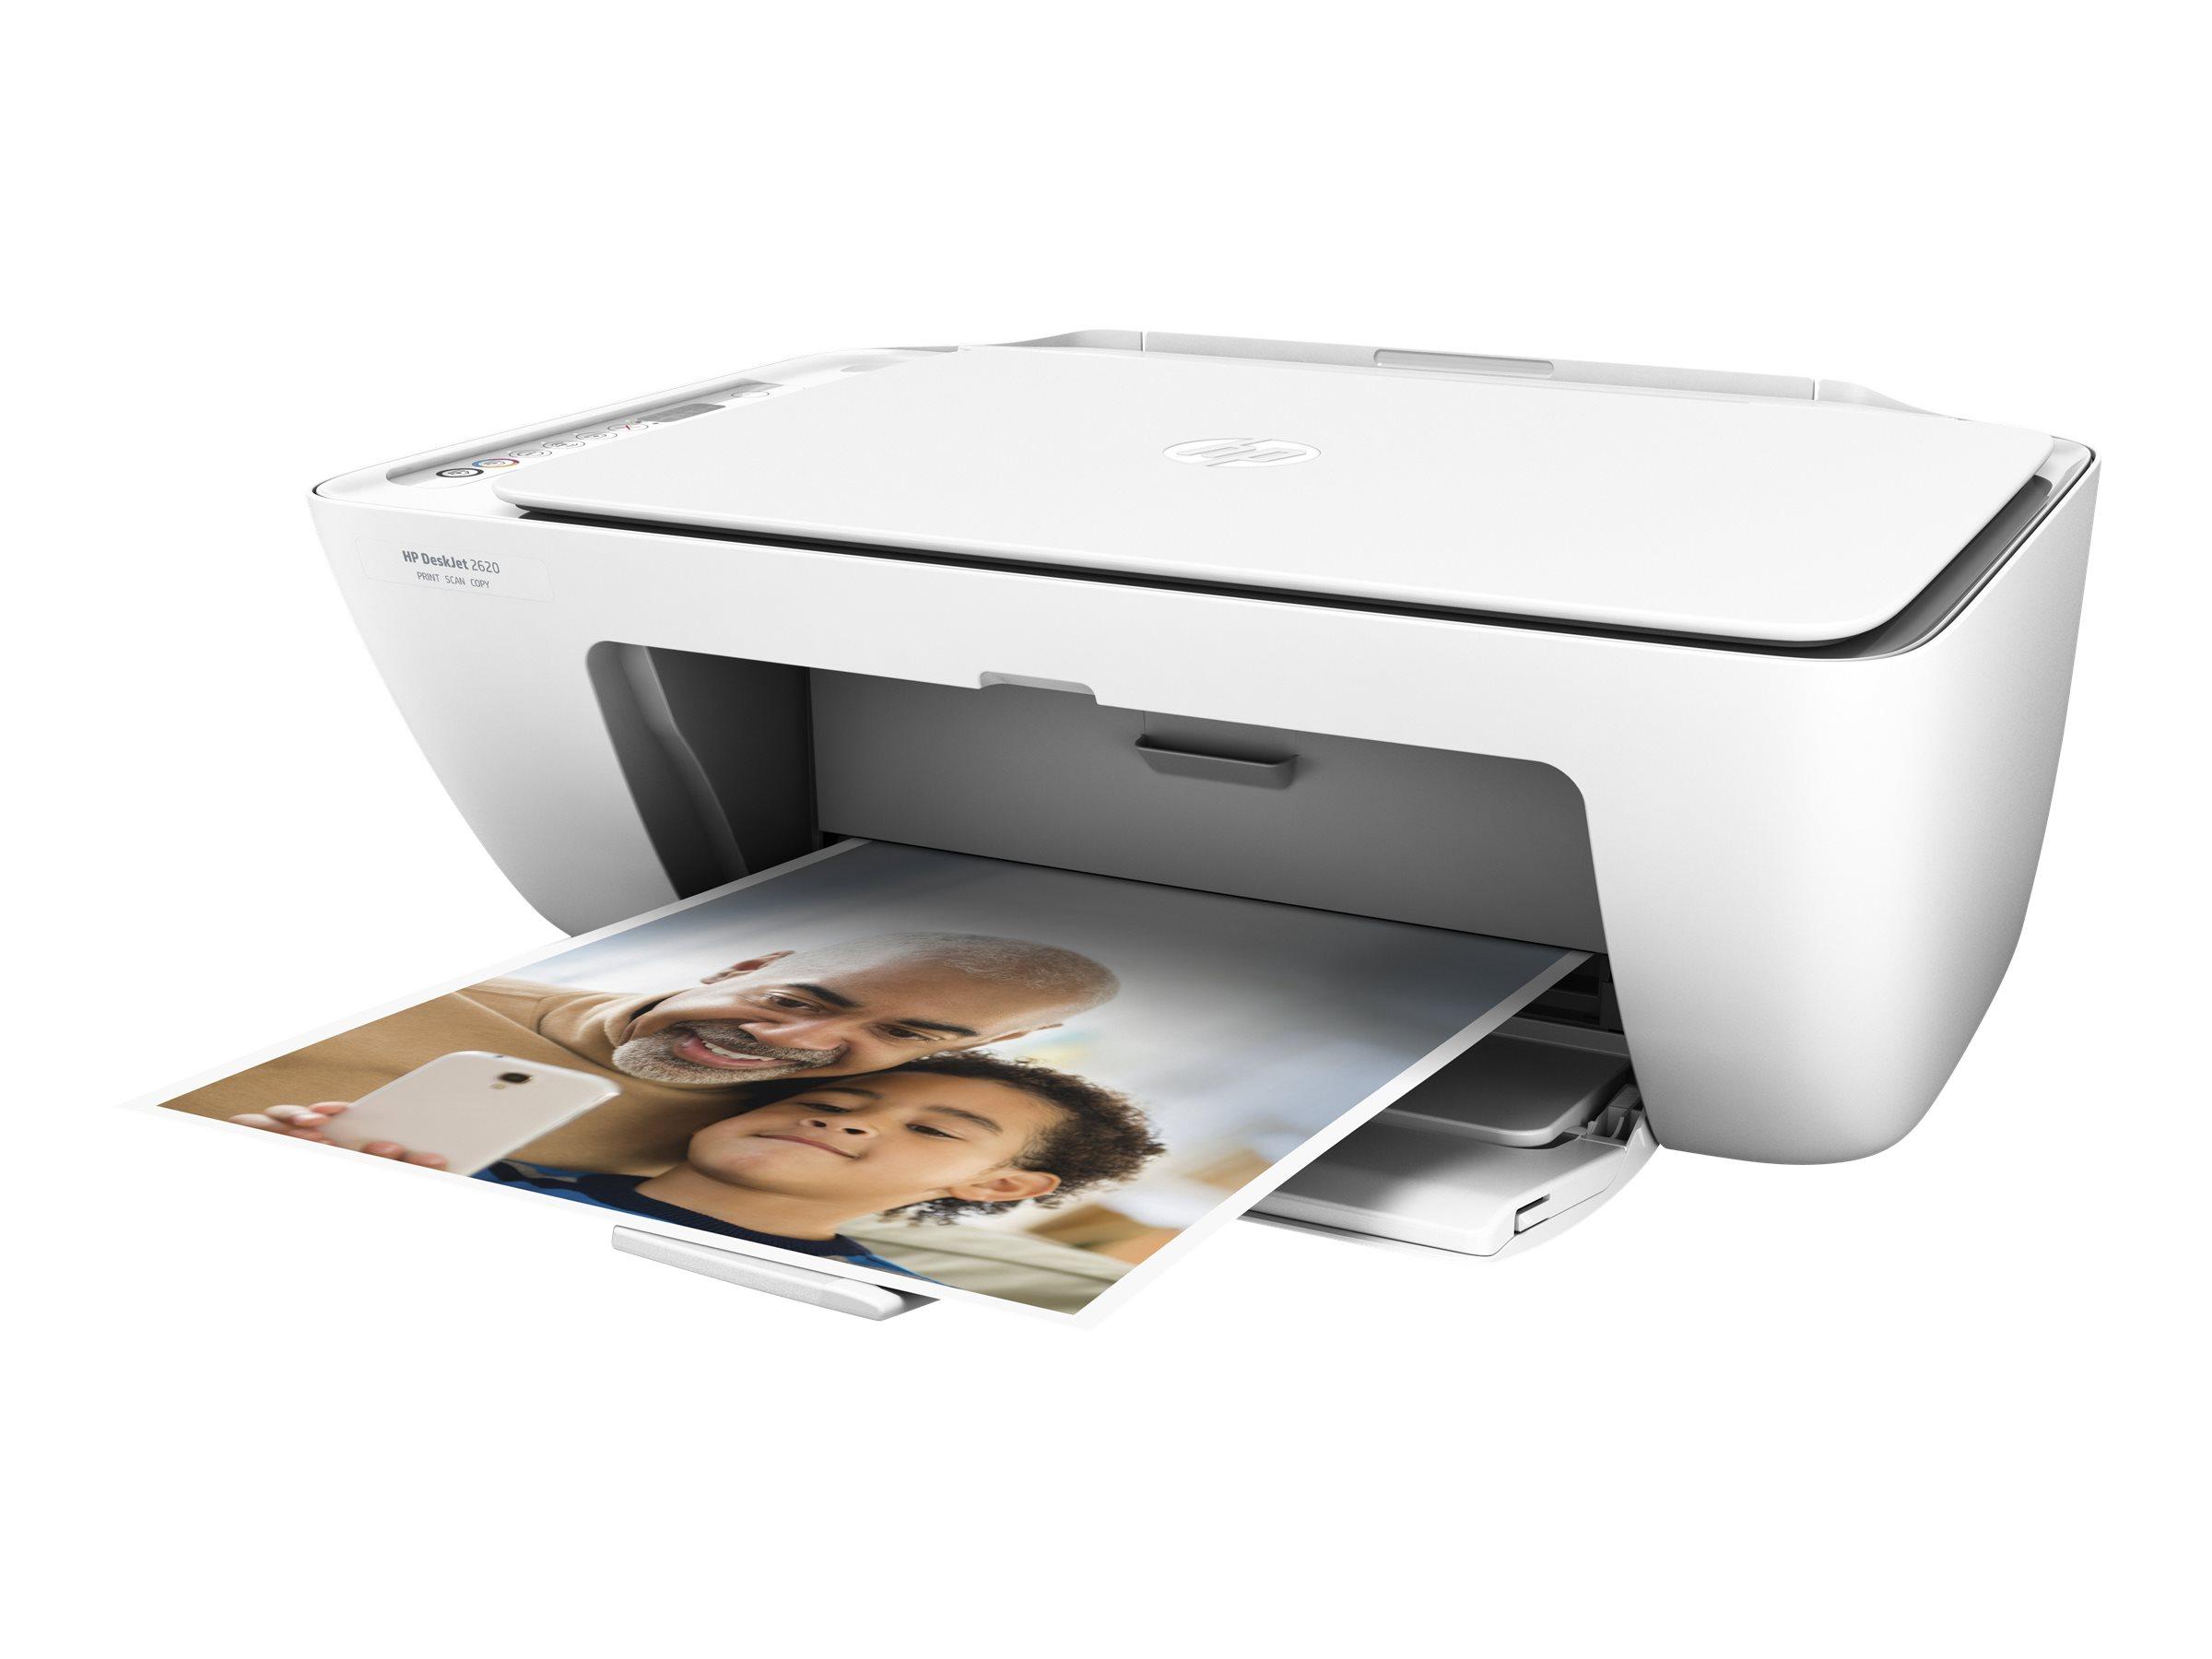 HP Deskjet 2620 All-in-One - imprimante multifonctions jet d'encre couleur A4 - Wifi, USB